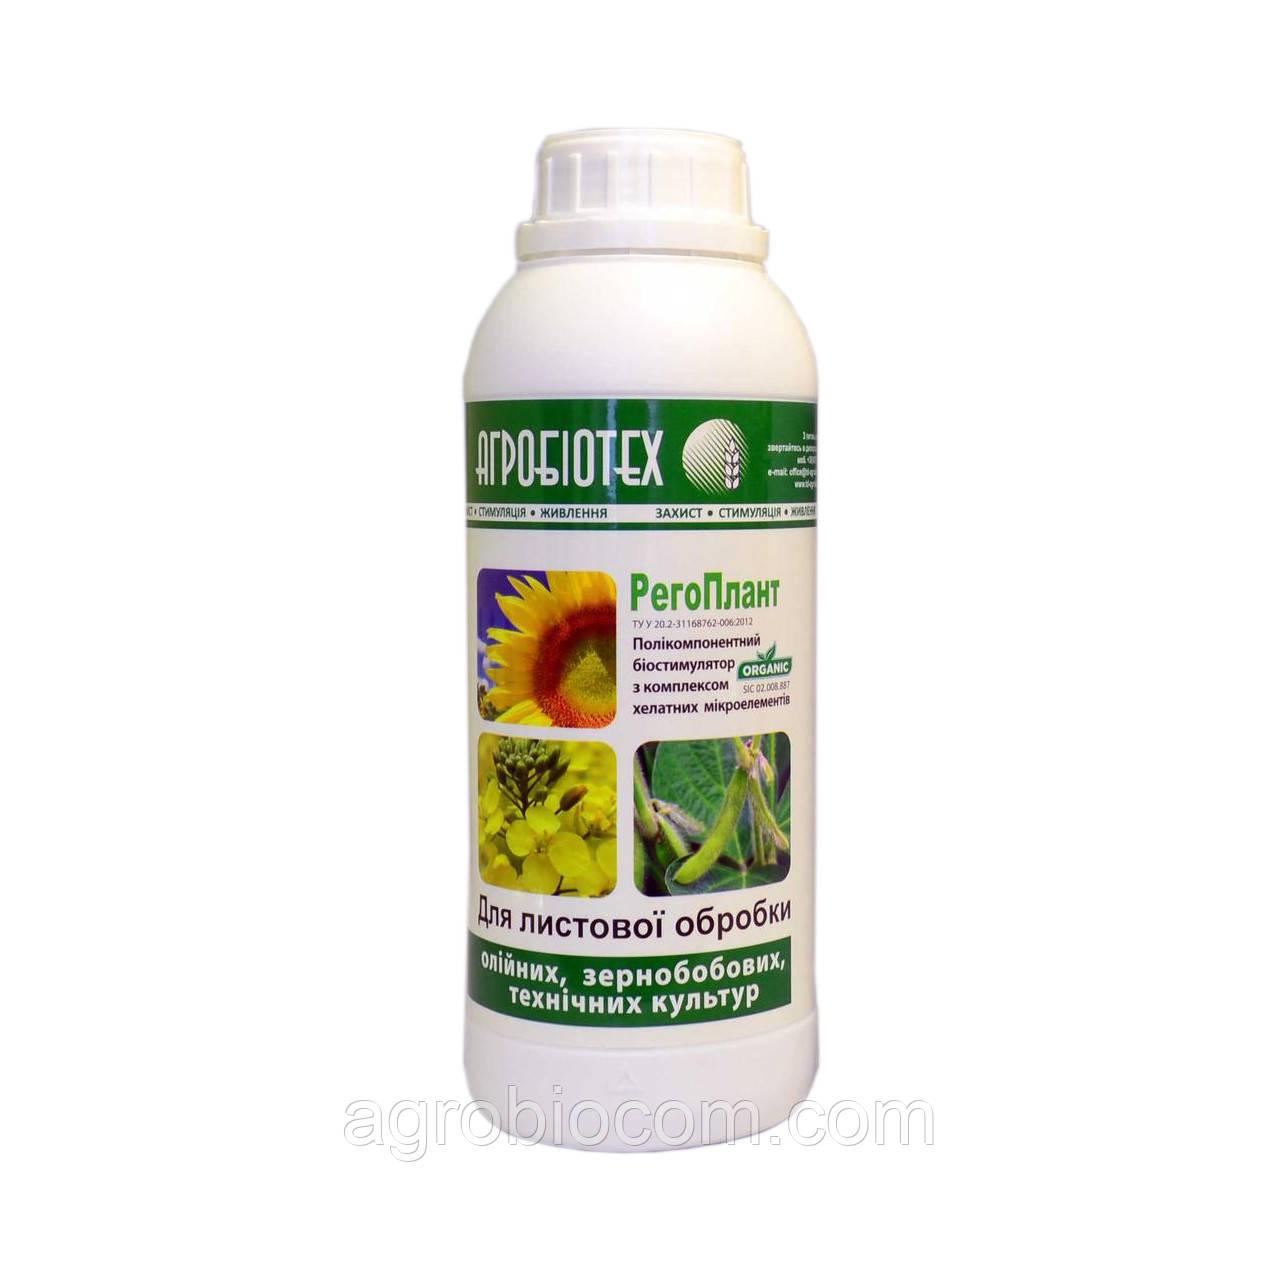 Регулятор роста растений Регоплант 1